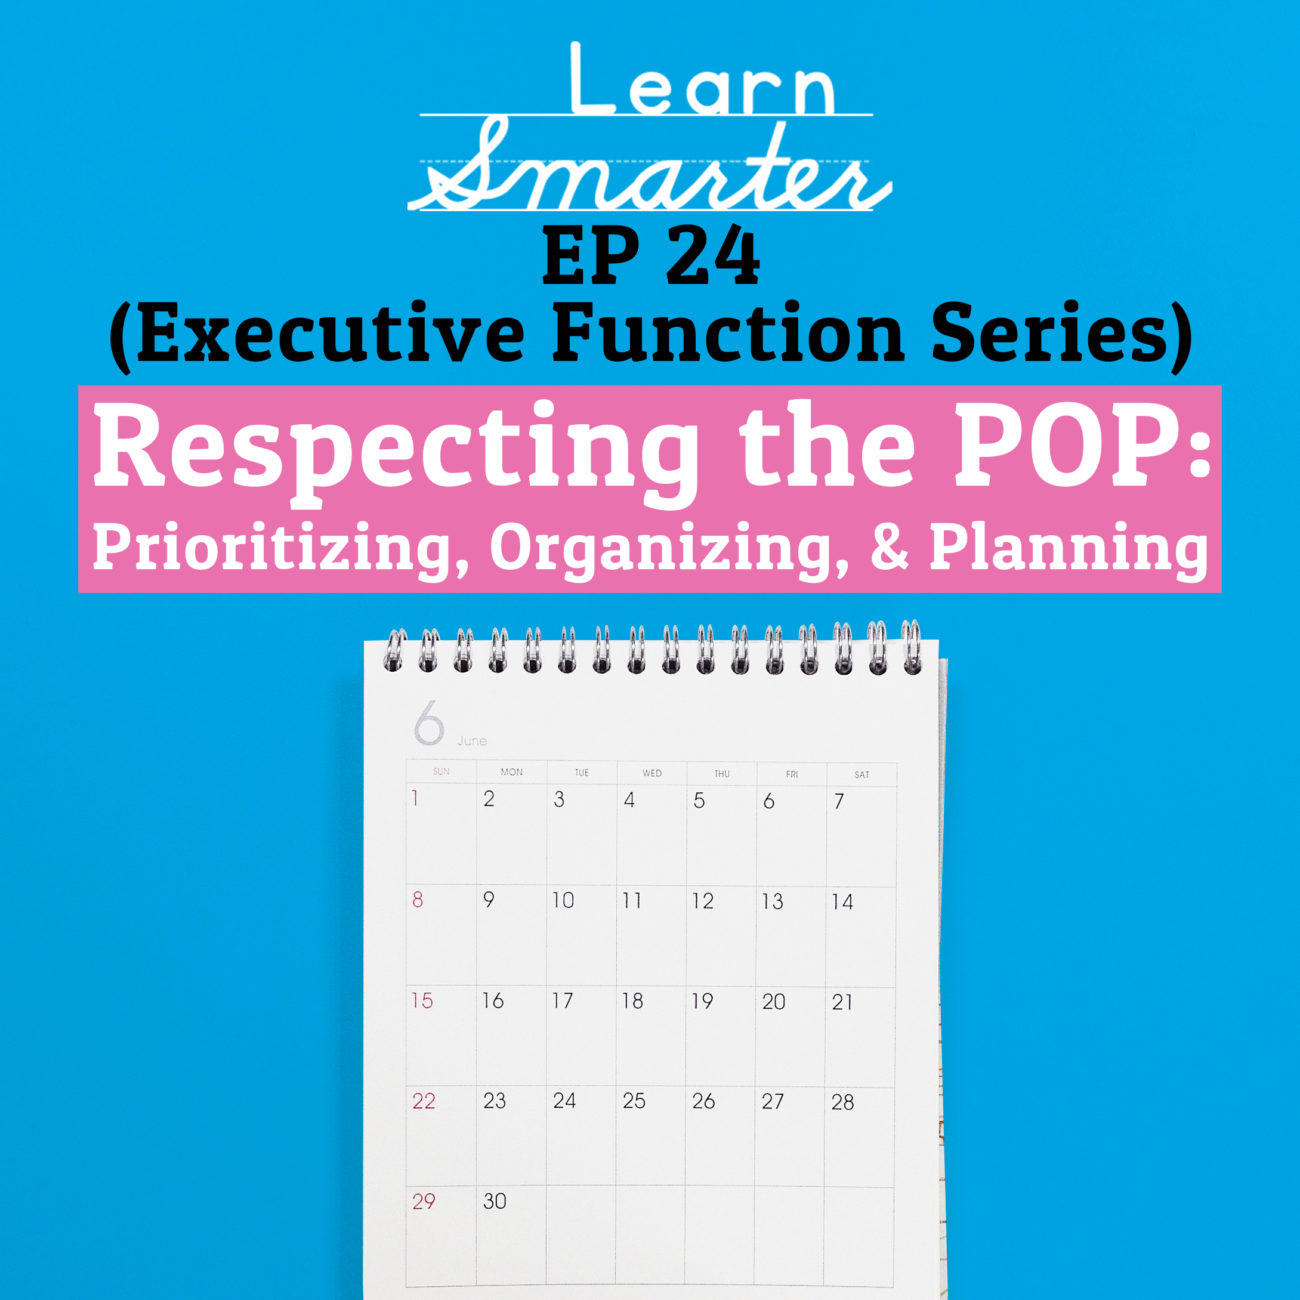 24: Respecting the POP: Prioritizing, Organizing, & Planning